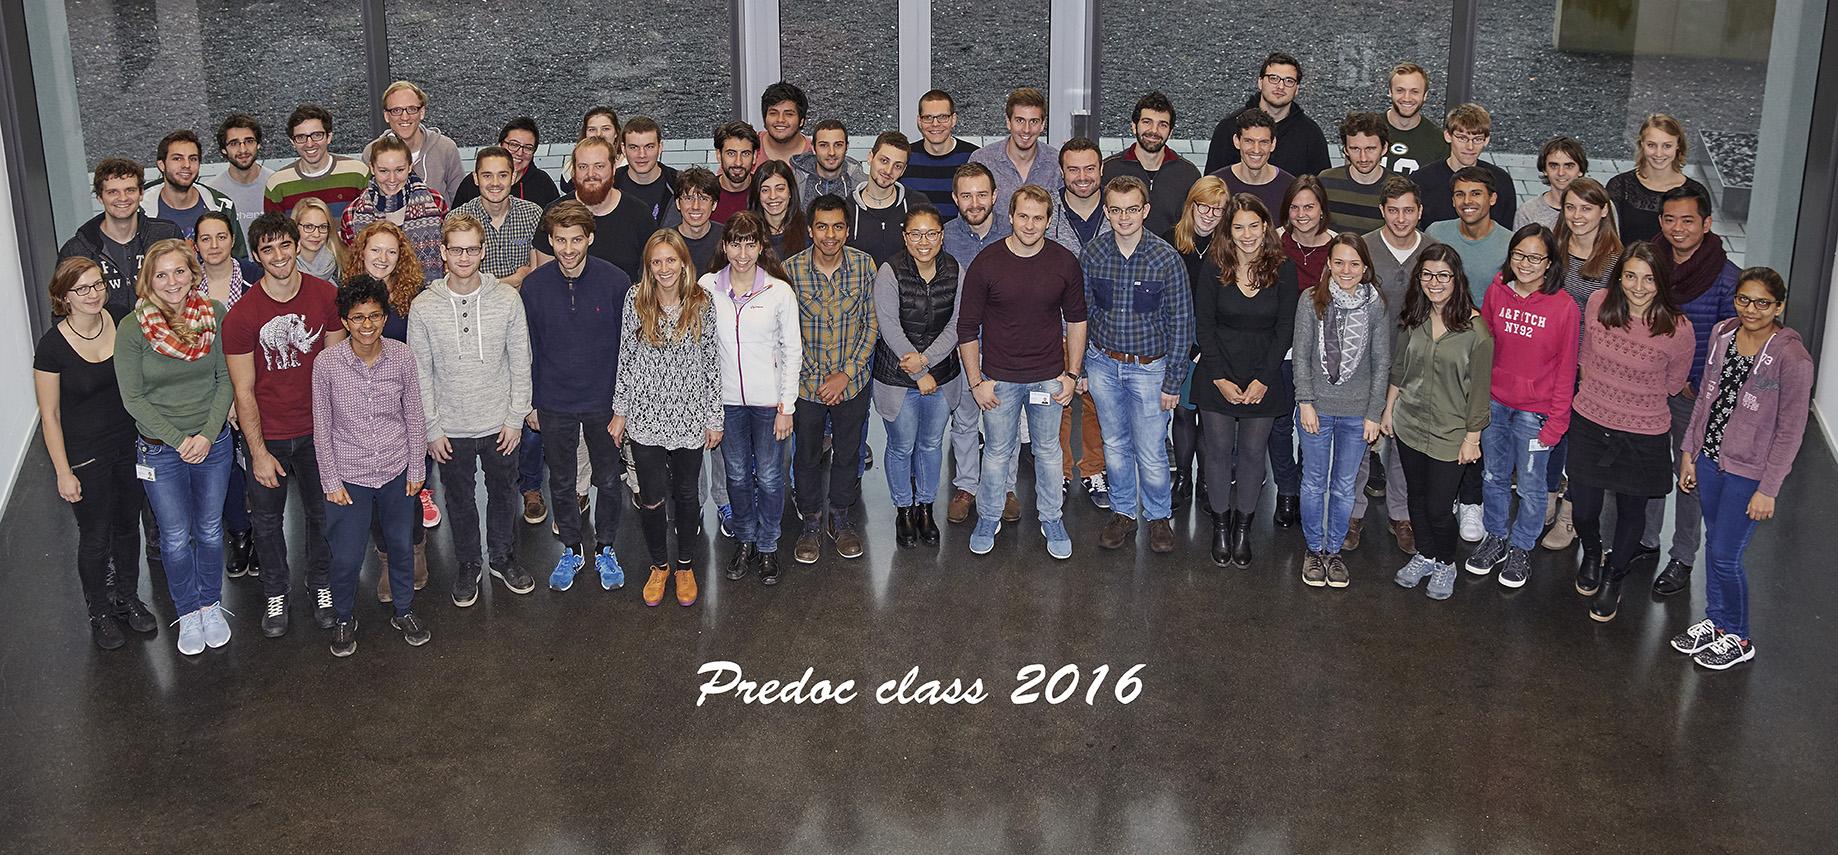 The 2016 intake of EMBL PhD students